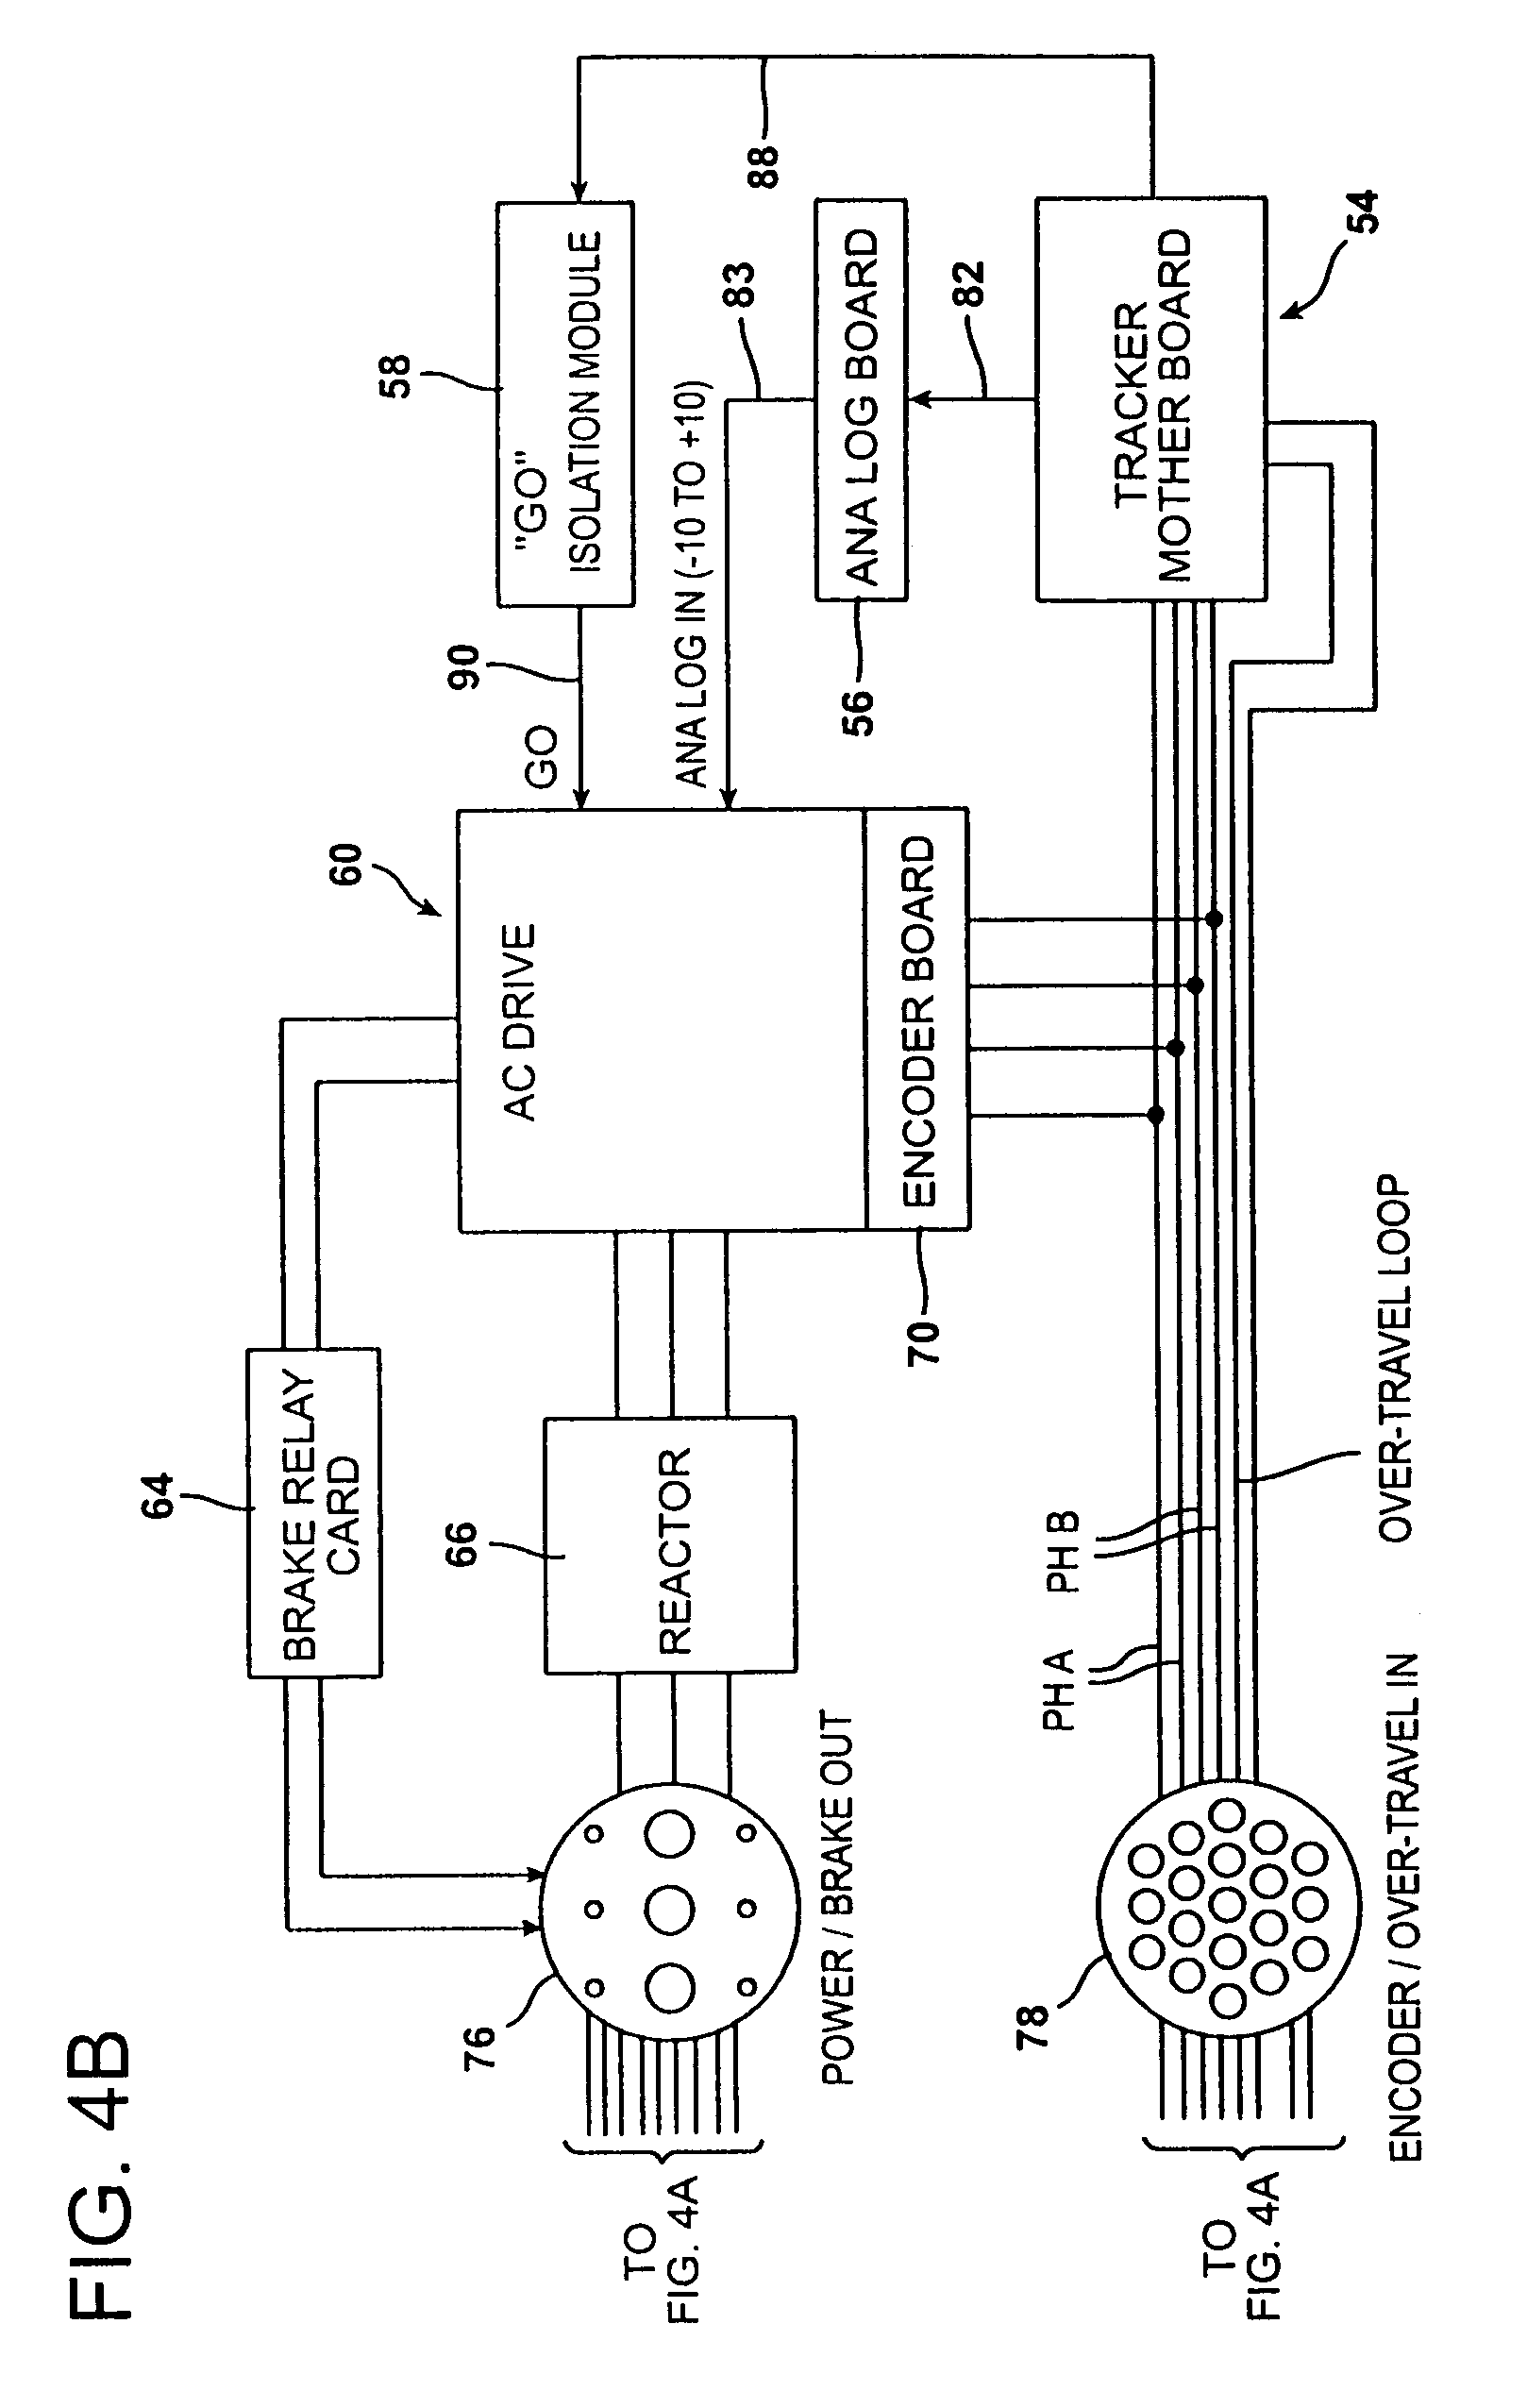 coffing hoist wiring diagram 2007 pontiac g6 radio cm 635 27 images